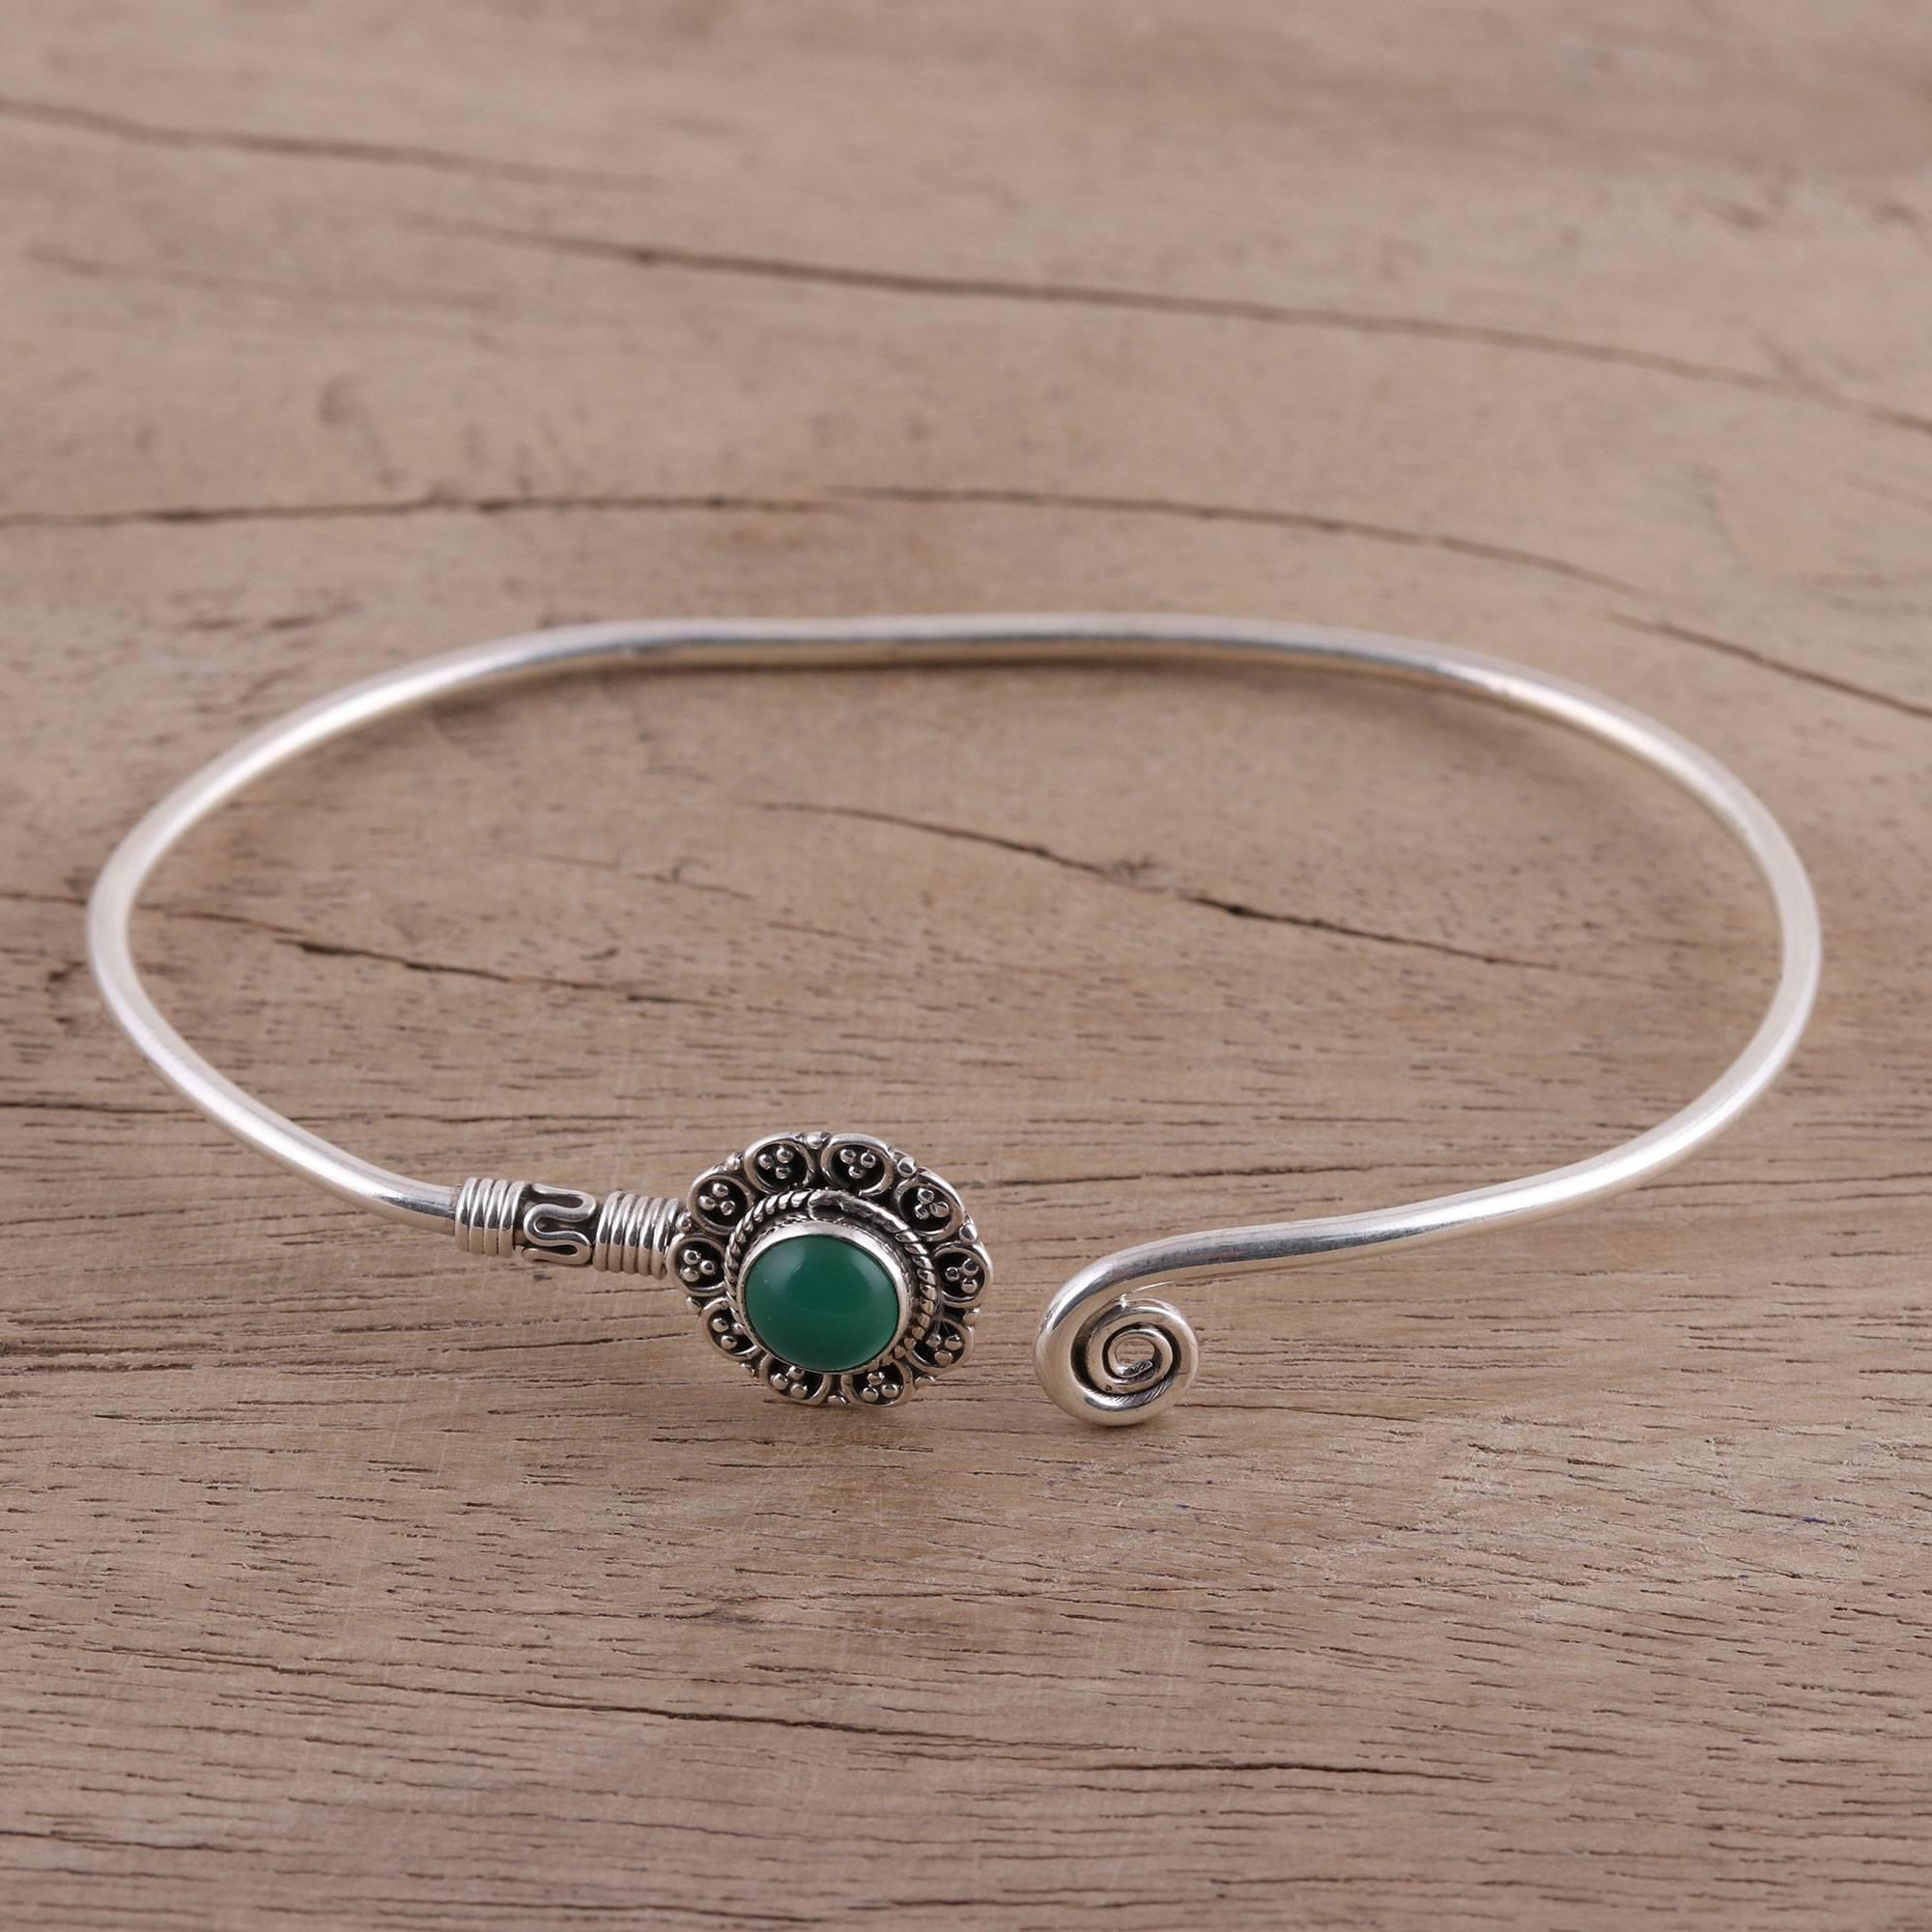 Free shipping Green Onyx Bracelet Natural Gemstone Delicate Bracelet